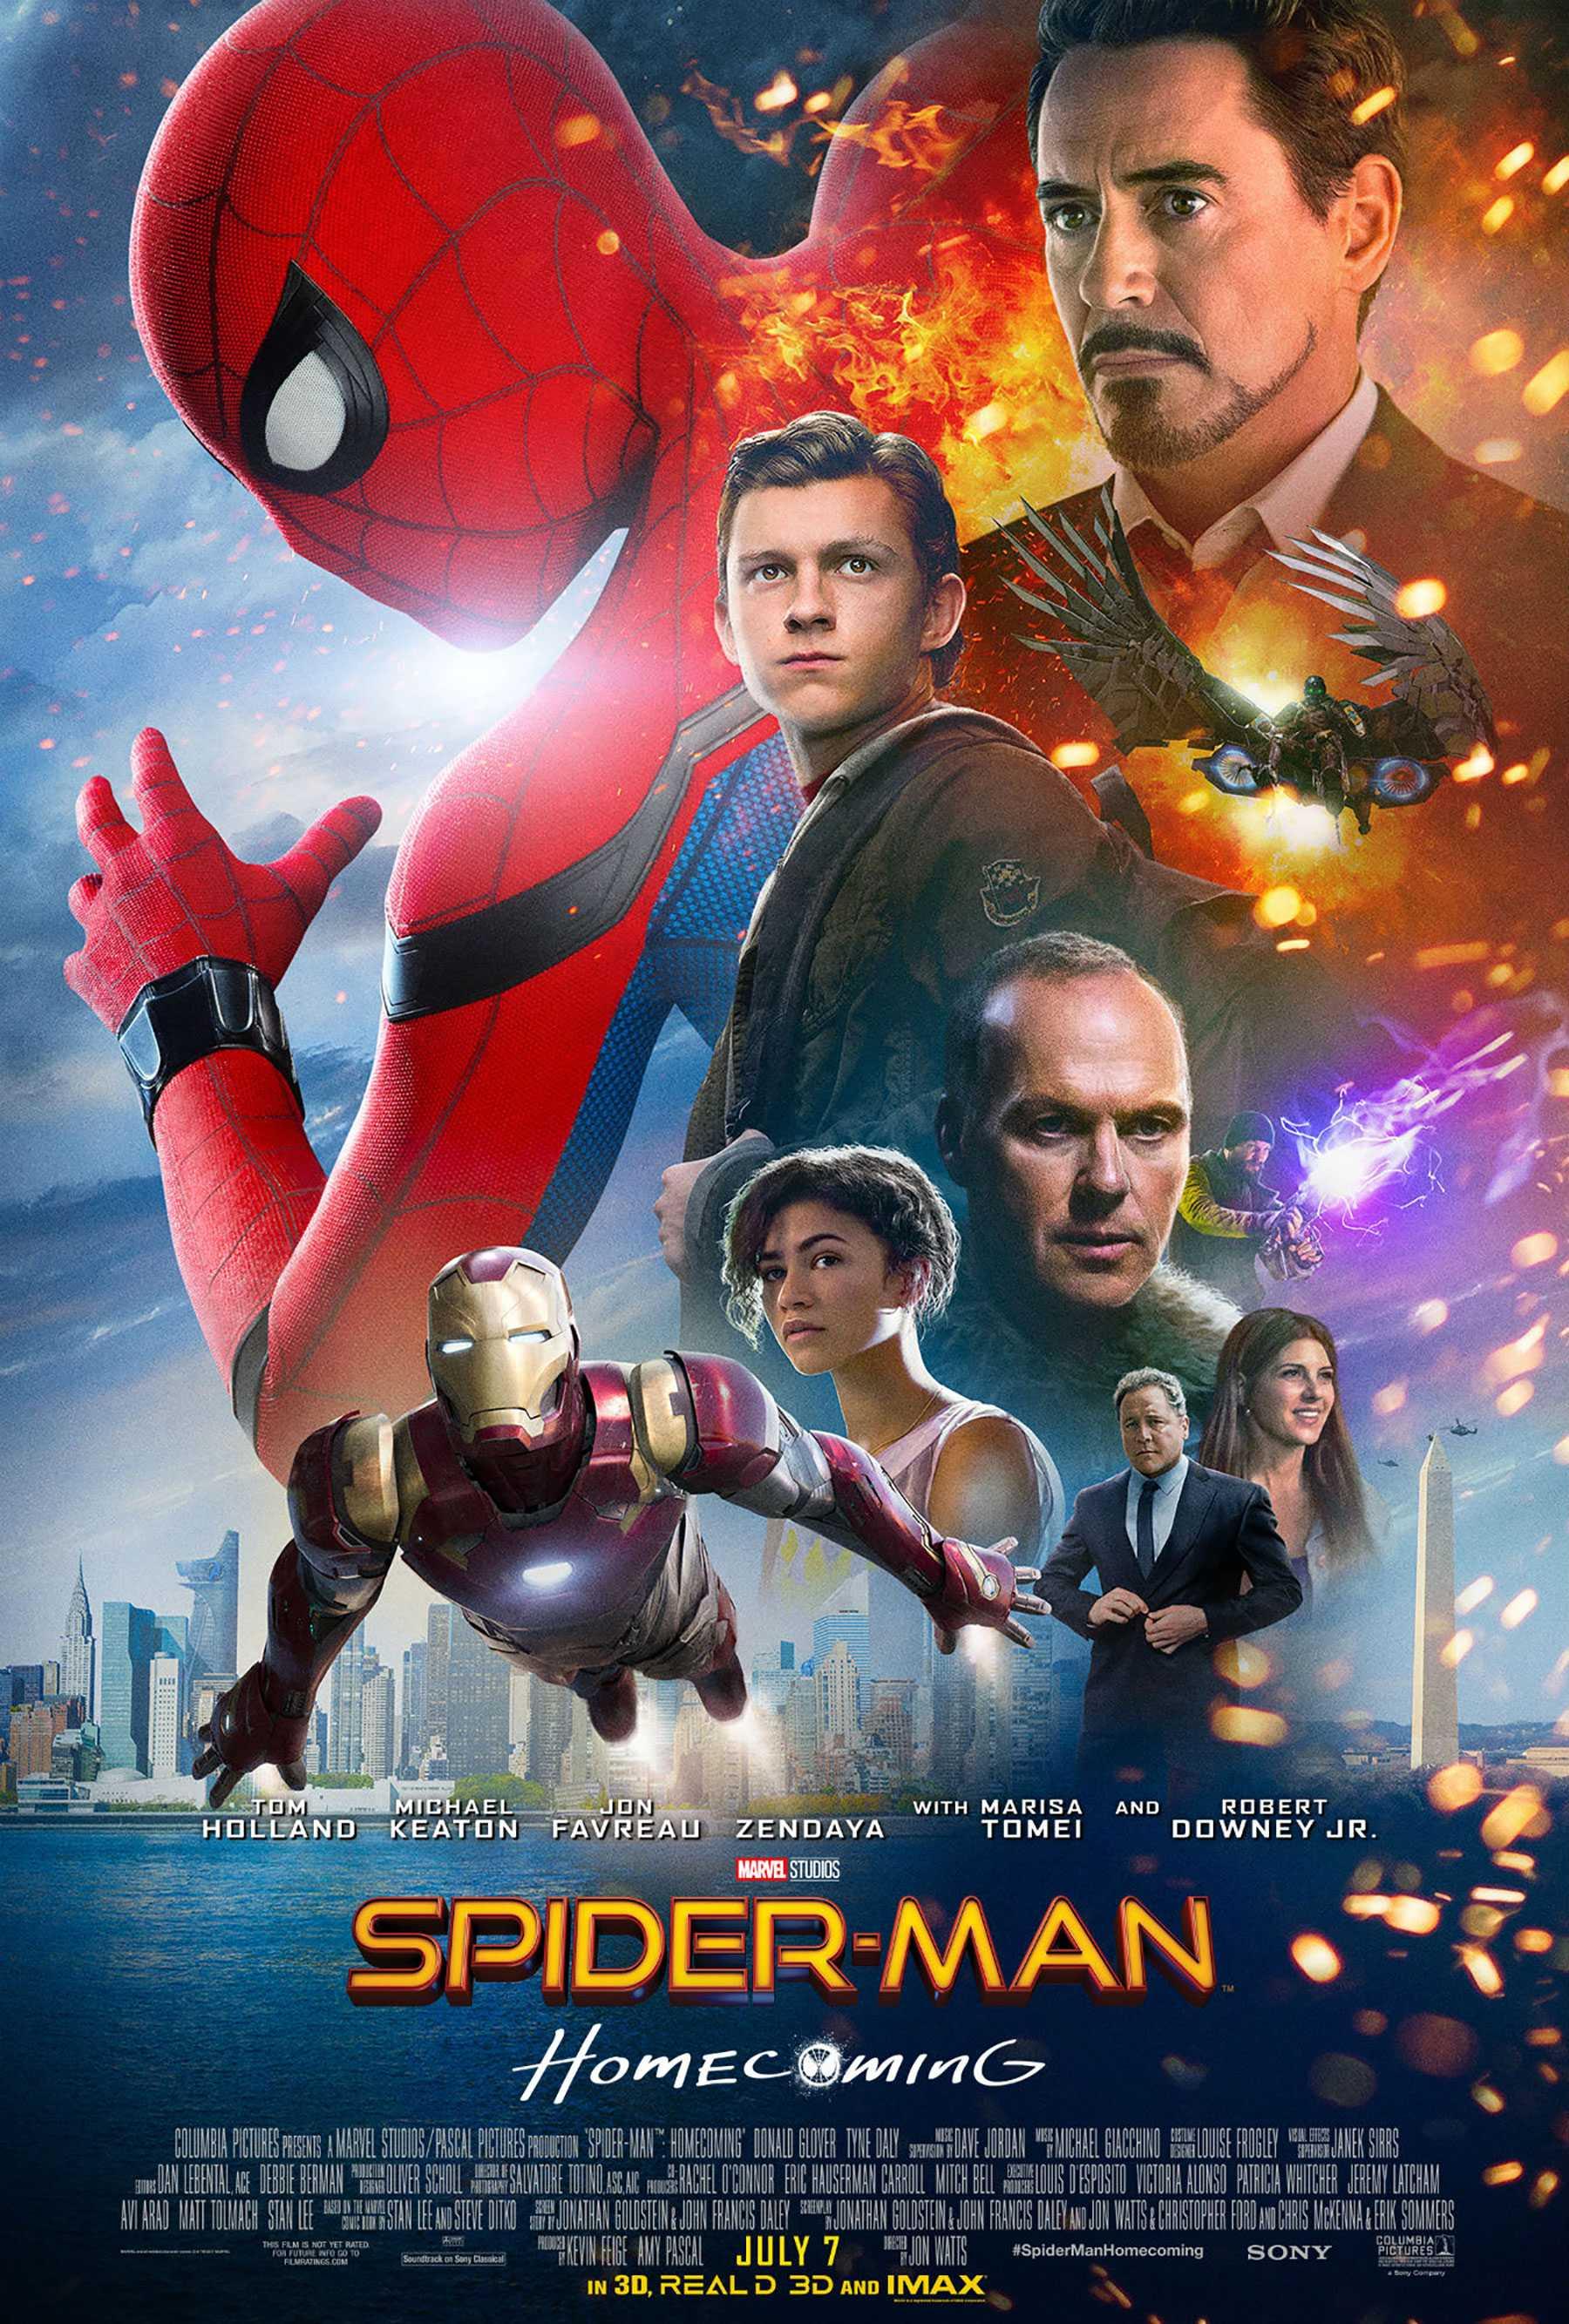 Spiderman-poster-7-large.jpg